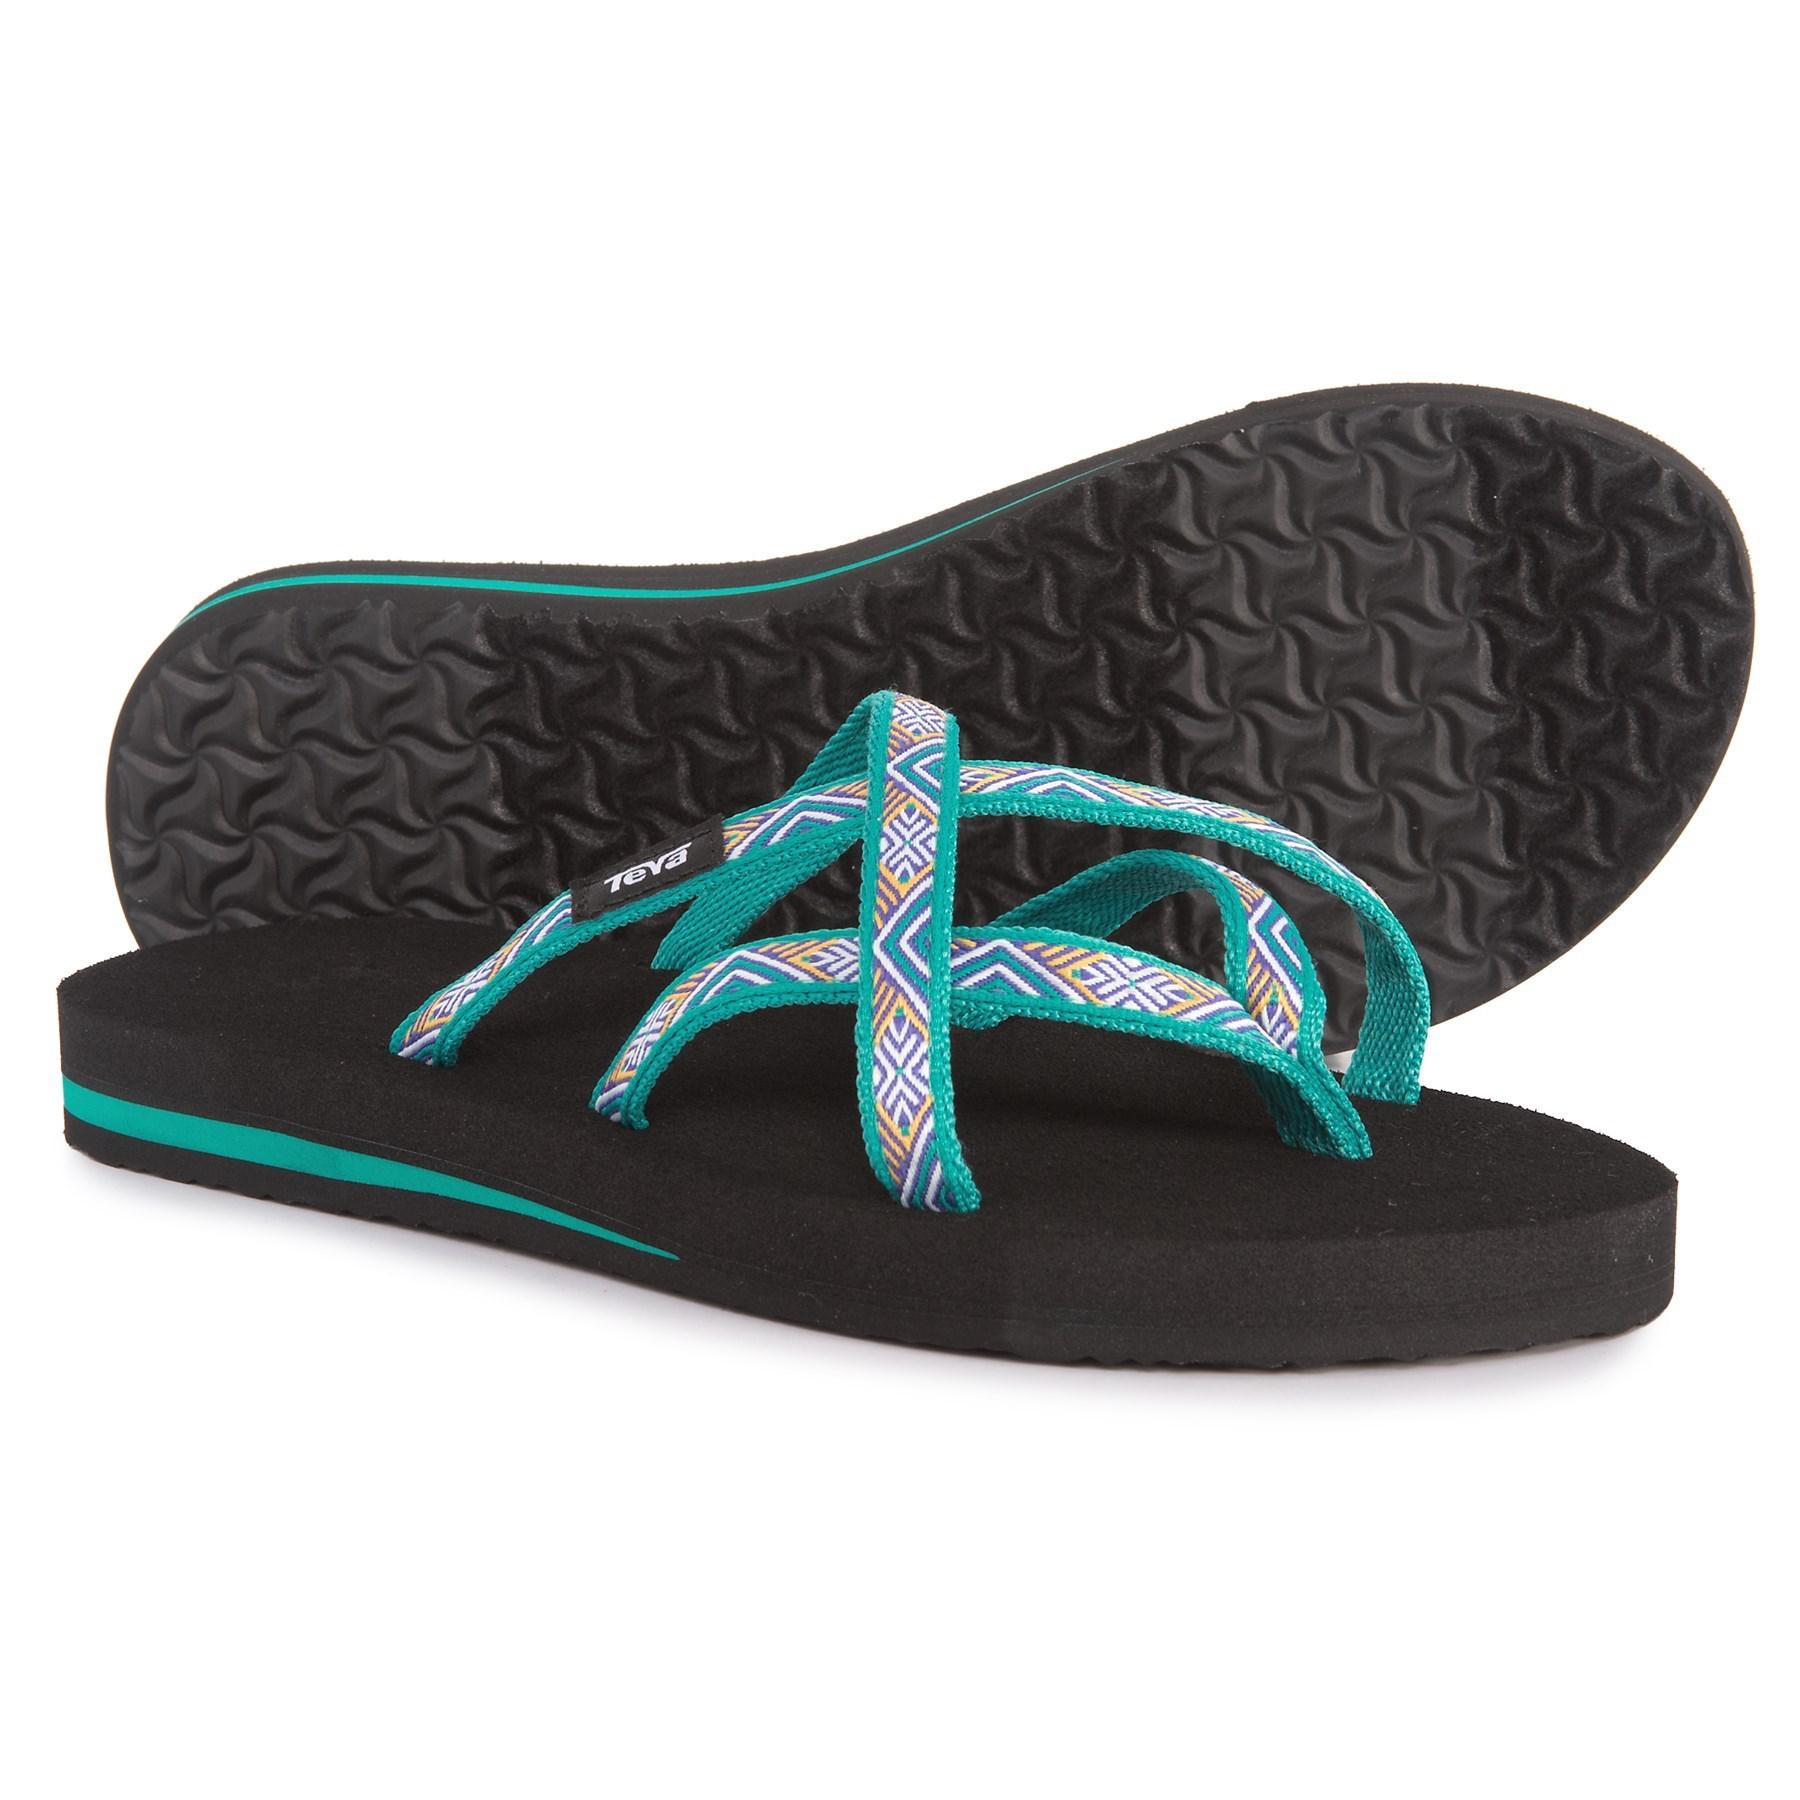 c2d0b00454f0 Lyst - Teva Olowahu Flip-flops (for Women)